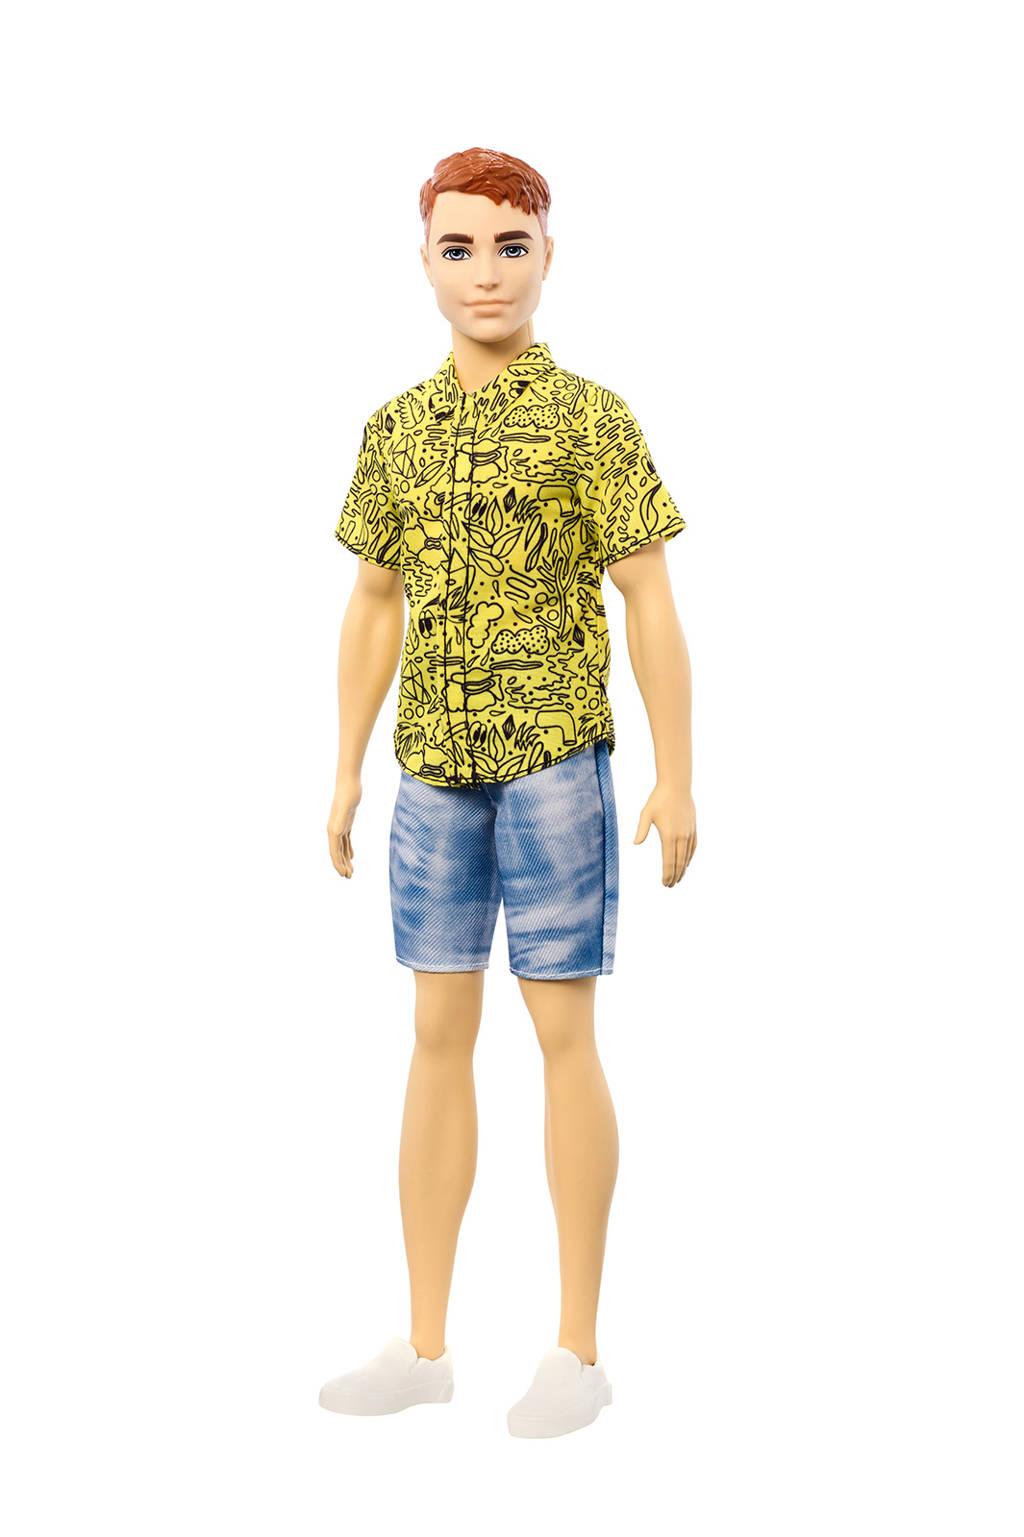 Barbie Ken Fashionistas rood haar